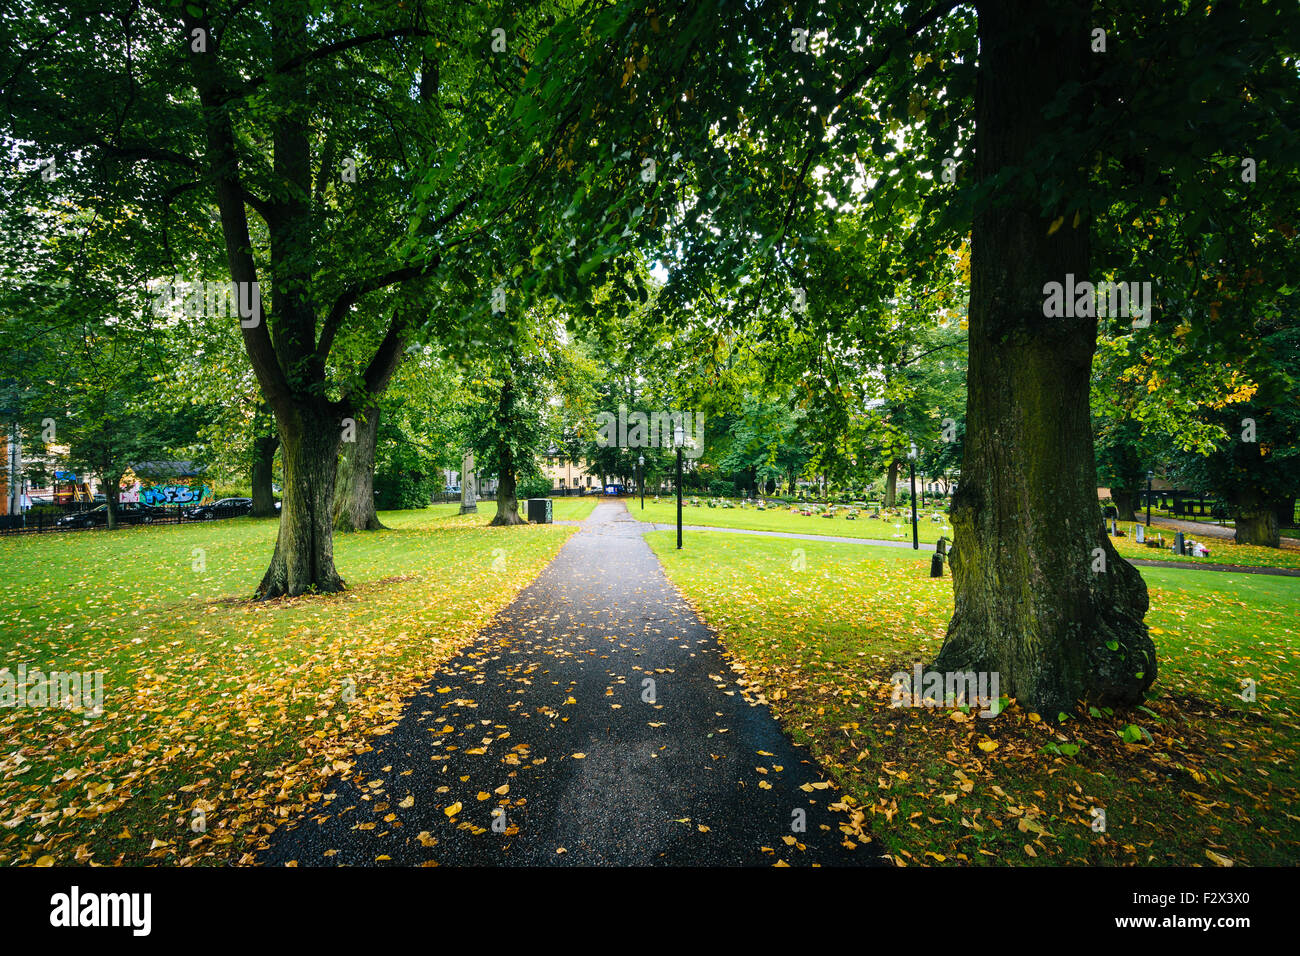 Trees along path outside Katarina kyrka, in Södermalm, Stockholm, Sweden. - Stock Image